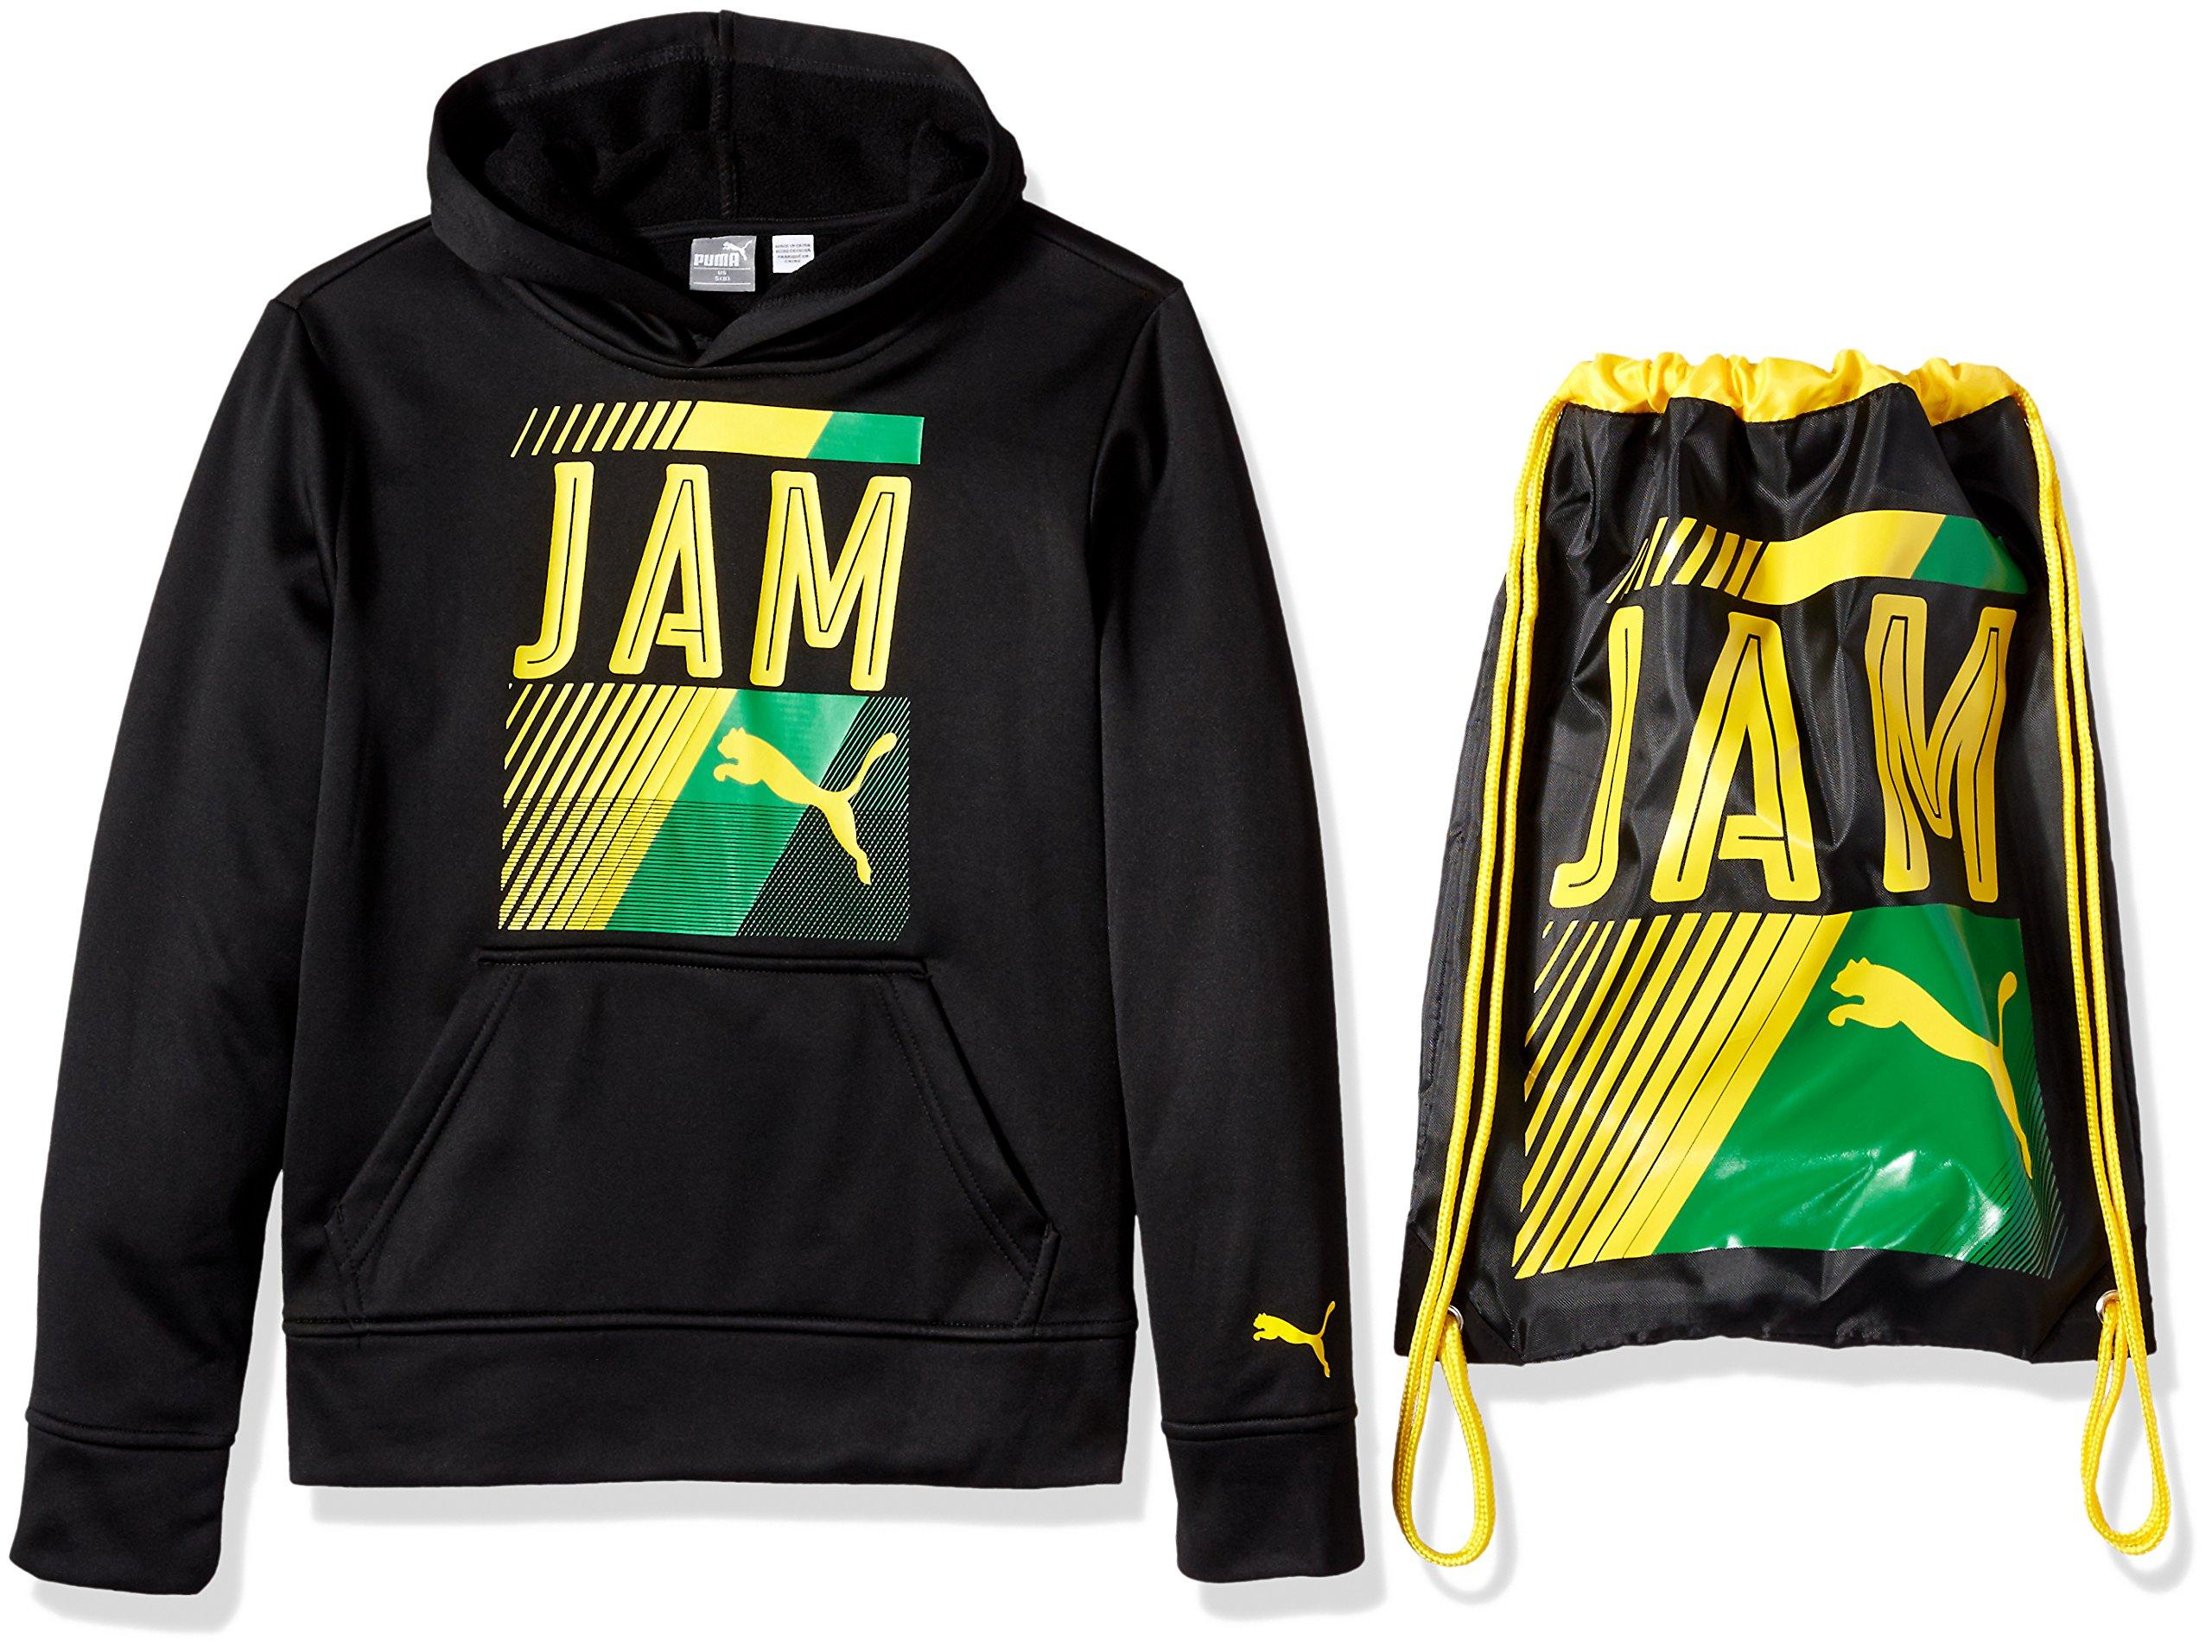 PUMA Big Boys' Jamaica Olympic Hoodie and Carry Sack, Black, Large (14/16)